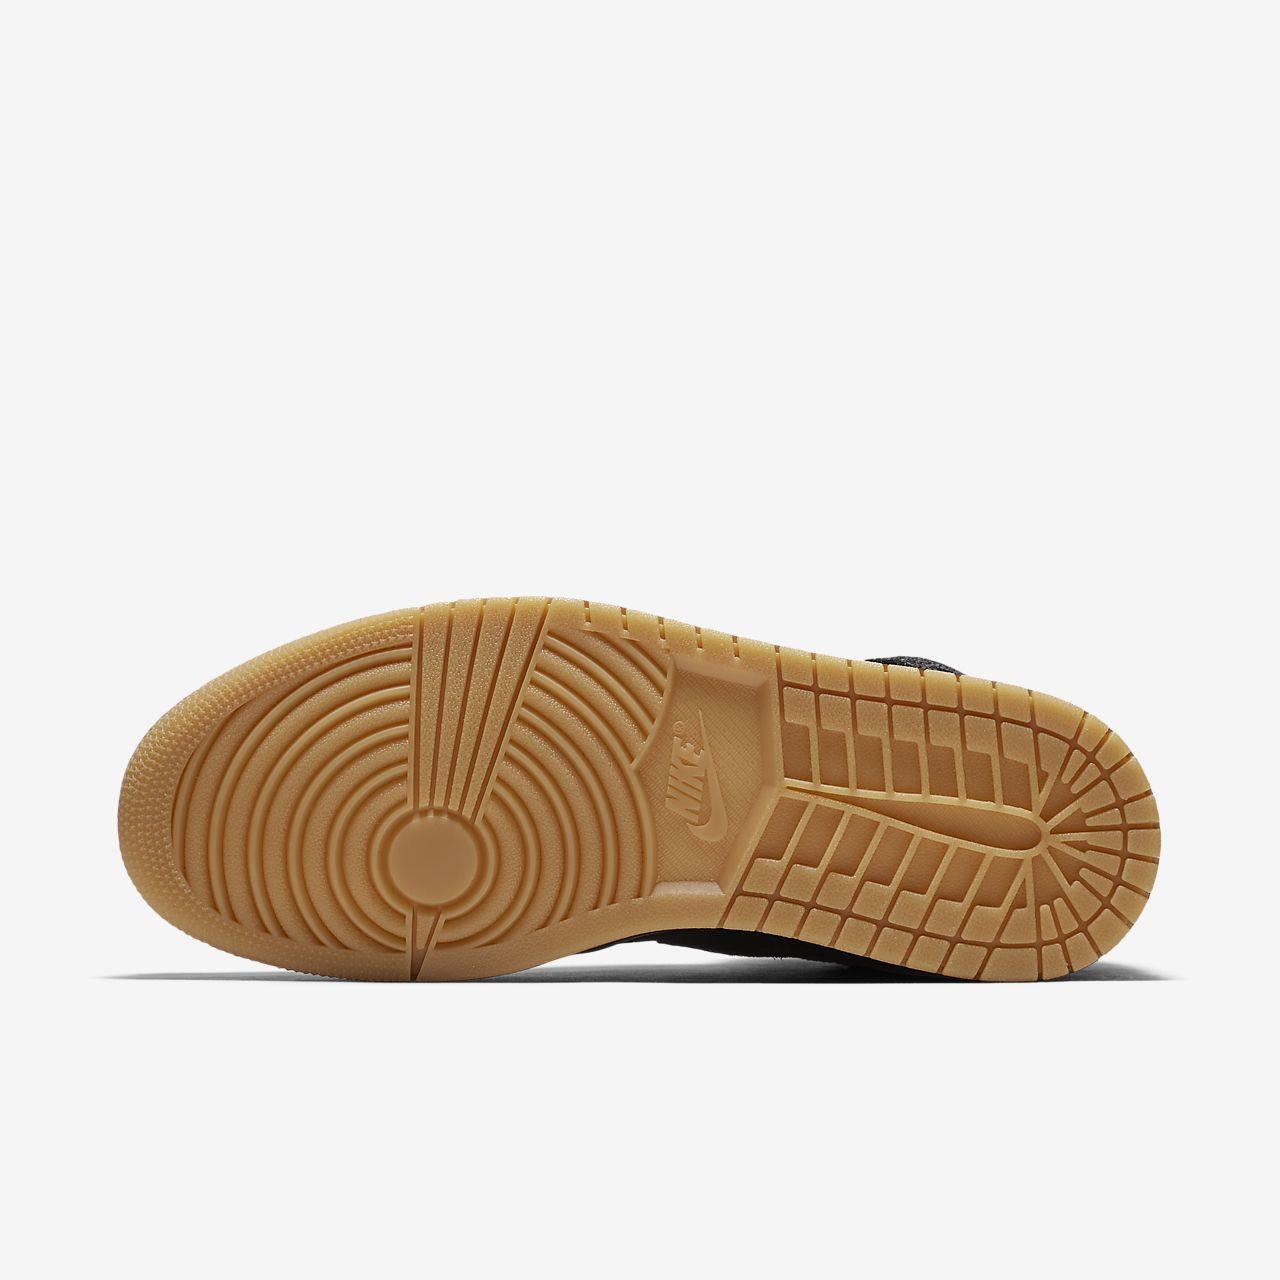 new style 52c32 e62d2 ... Chaussure Nike Air Jordan 1 Retro High Premium pour Femme